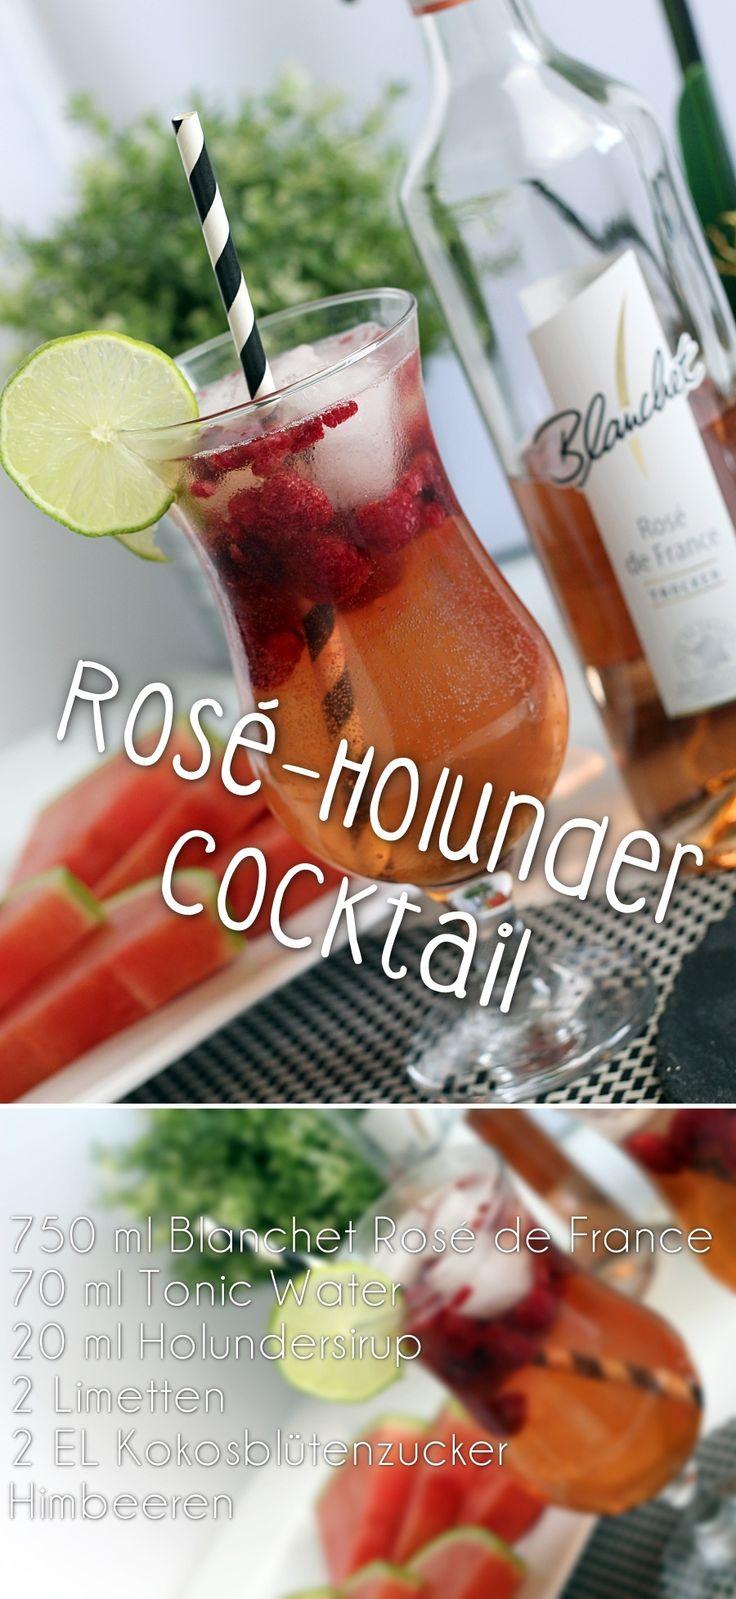 Rezept | Rosé-Holunder Cocktail - hydrogenperoxid.net